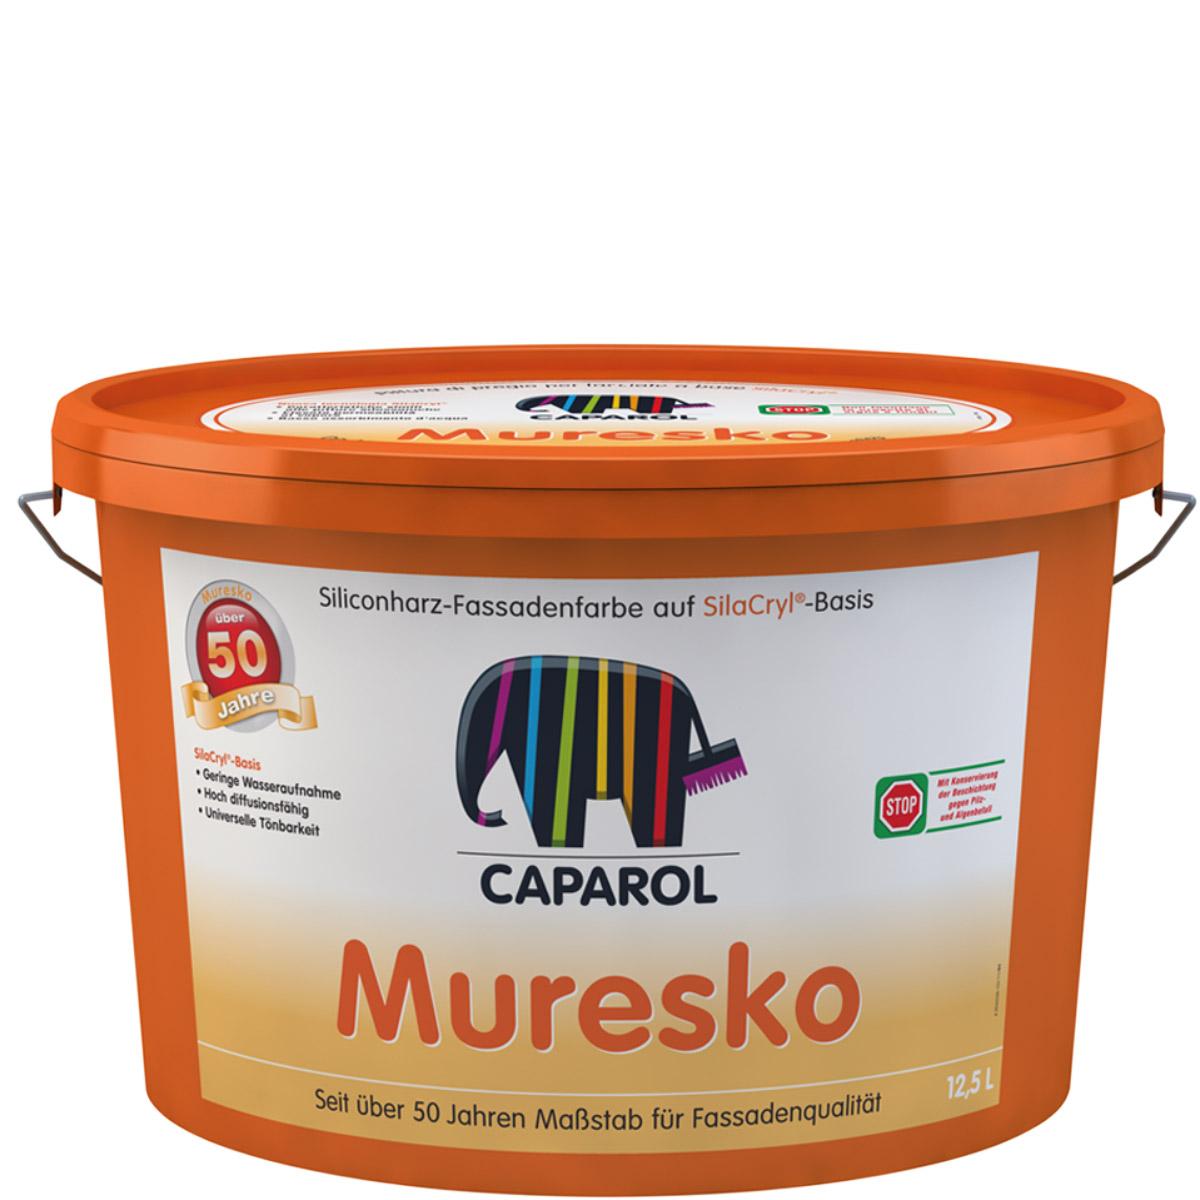 Caparol Muresko SilaCryl 12,5L weiss ,Fassadenfarbe